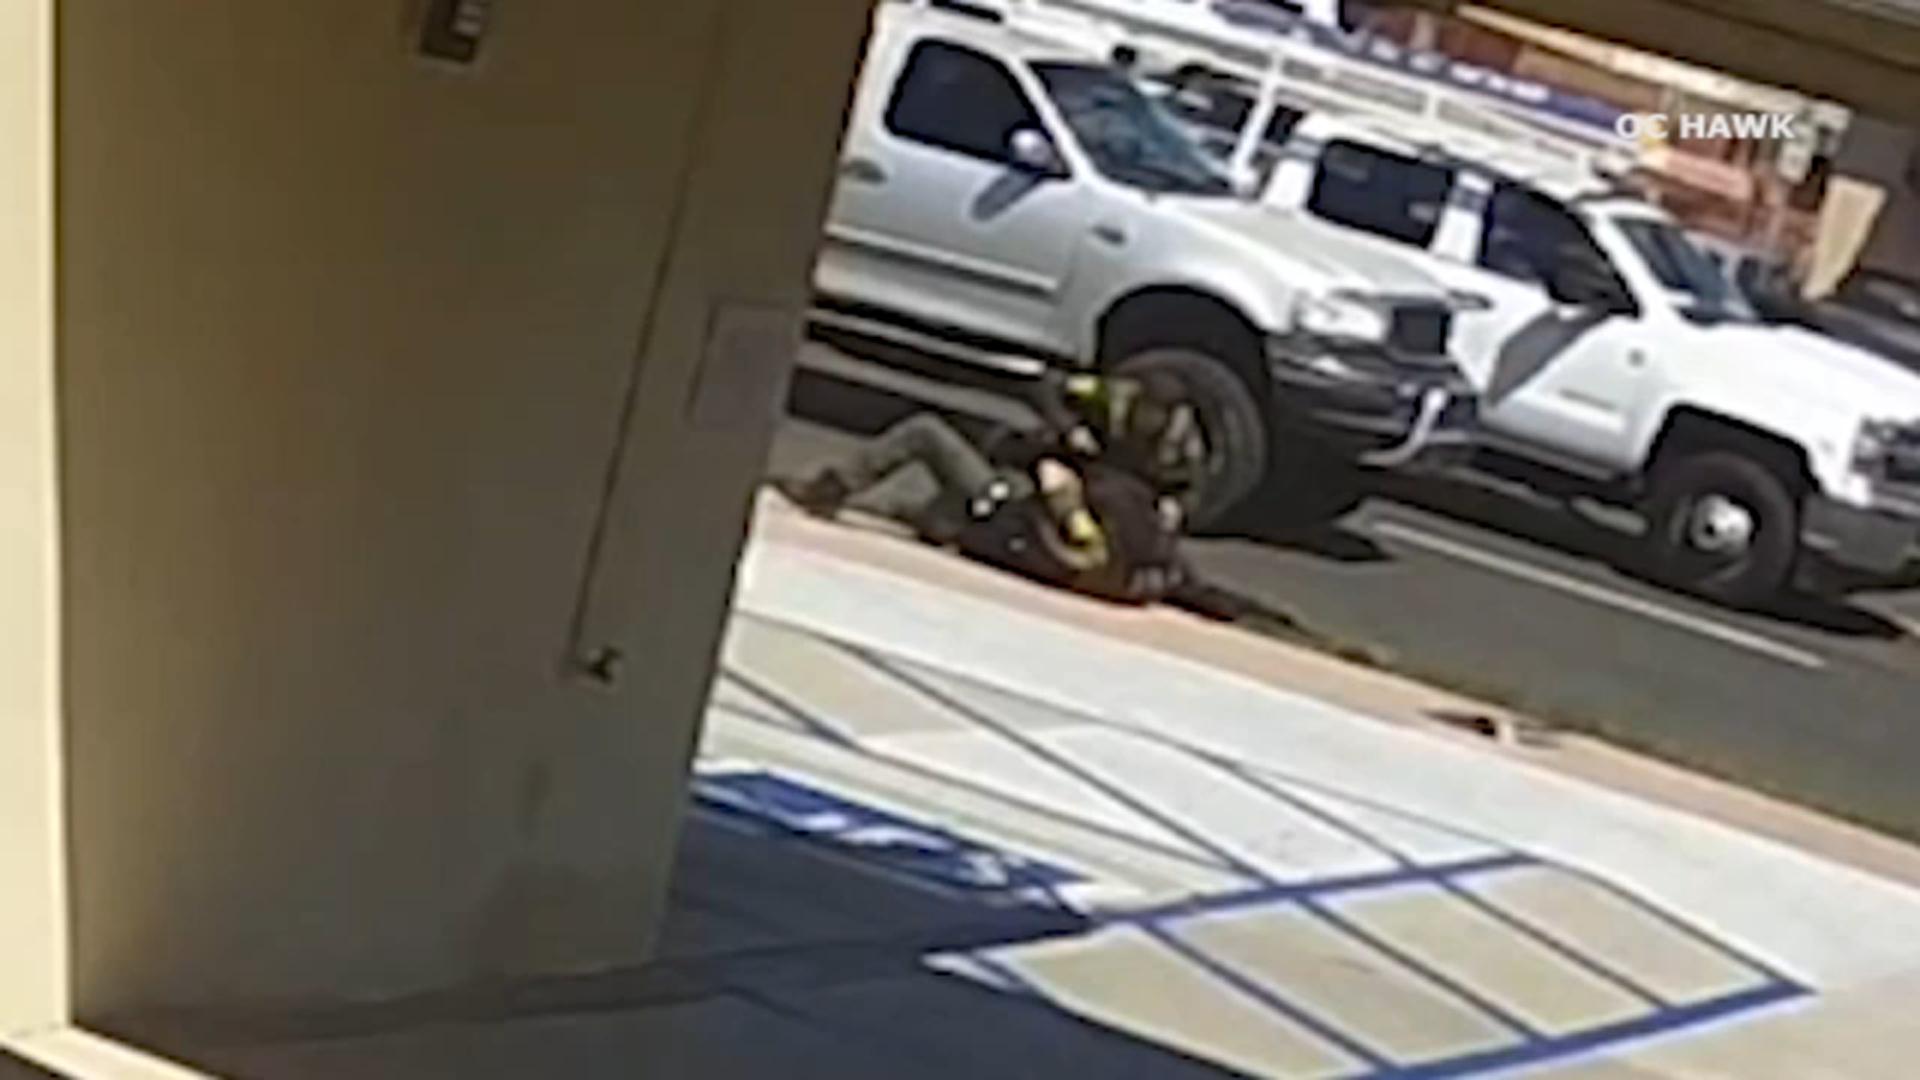 Video shows struggle between homeless man, OC deputies before fatal shooting in San Clemente